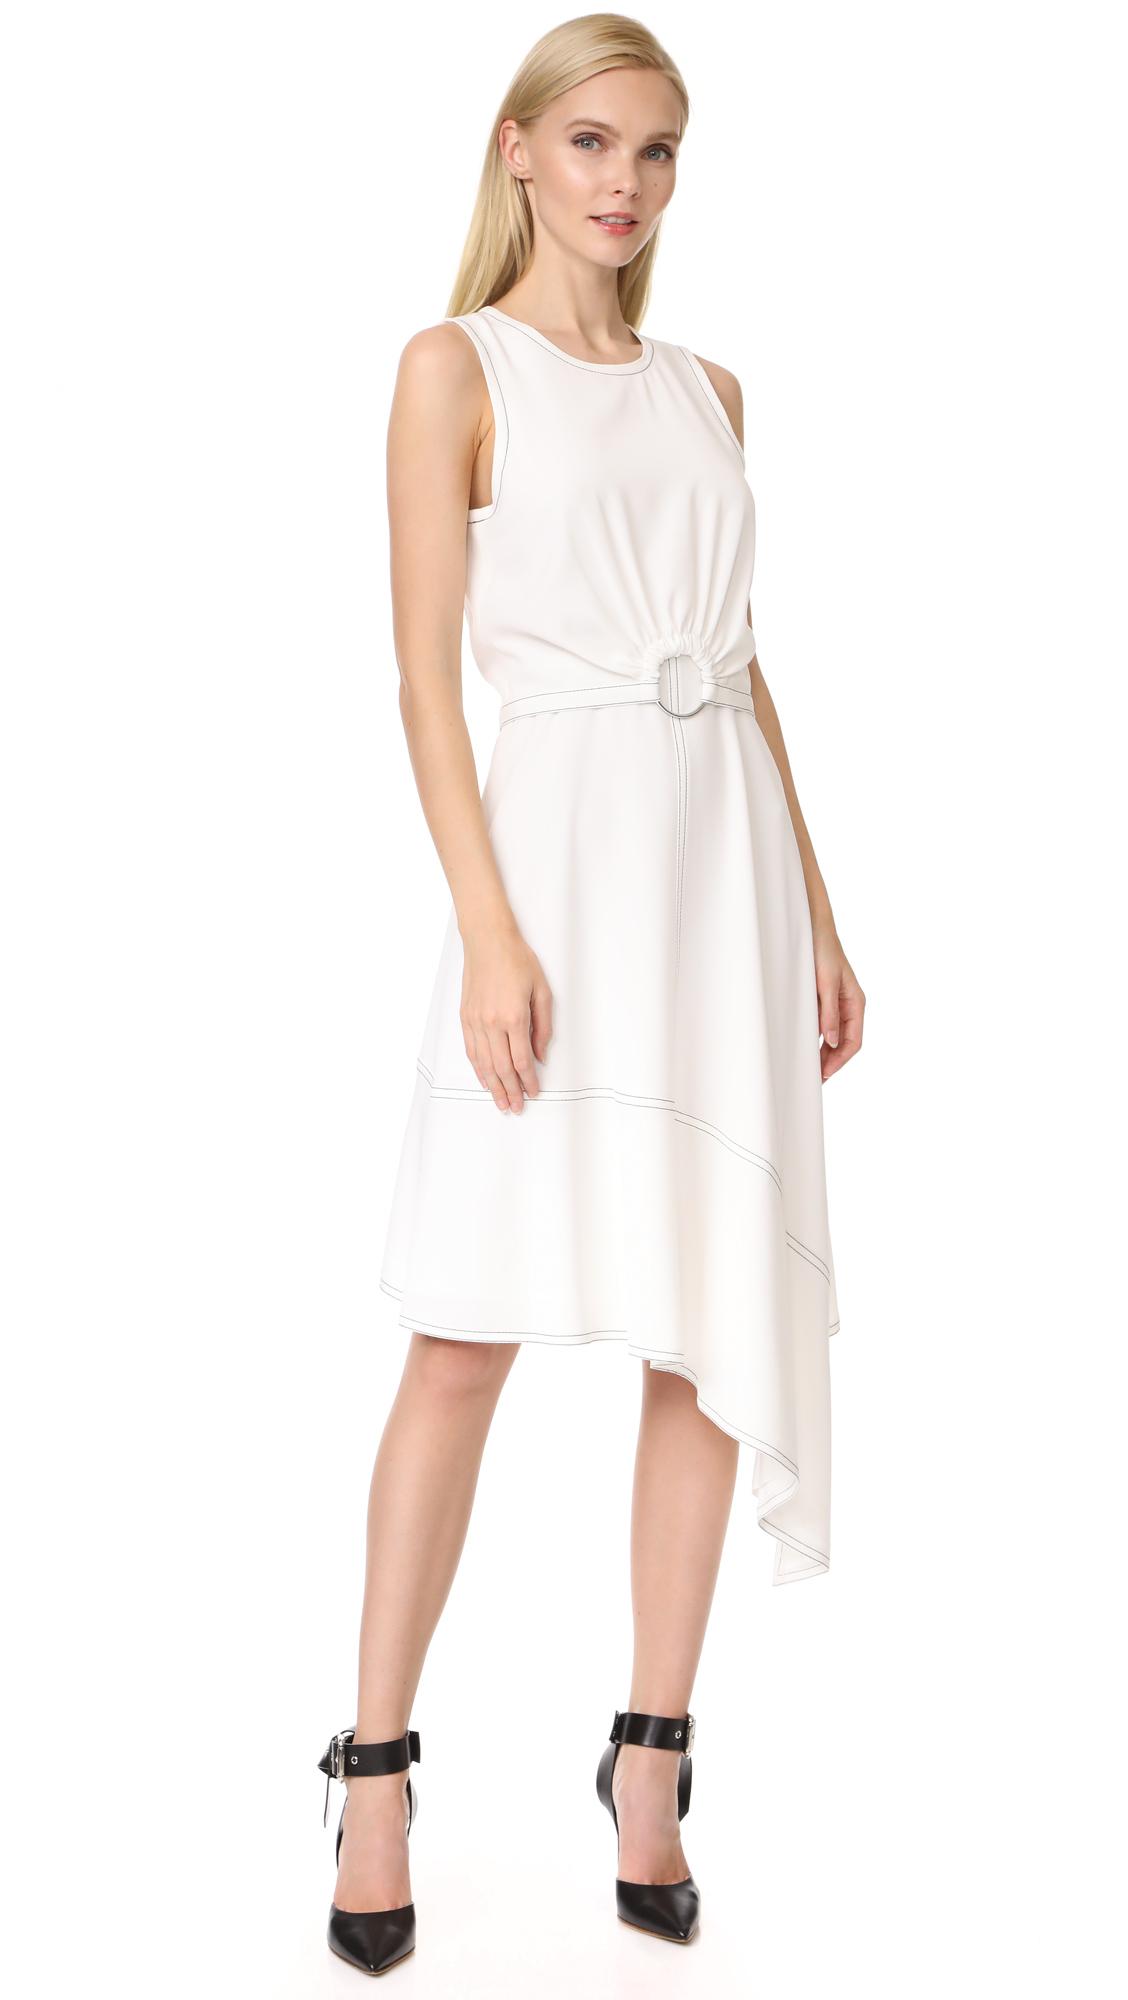 Derek Lam 10 Crosby Sleeveless Dress with Ring Detail - Soft White